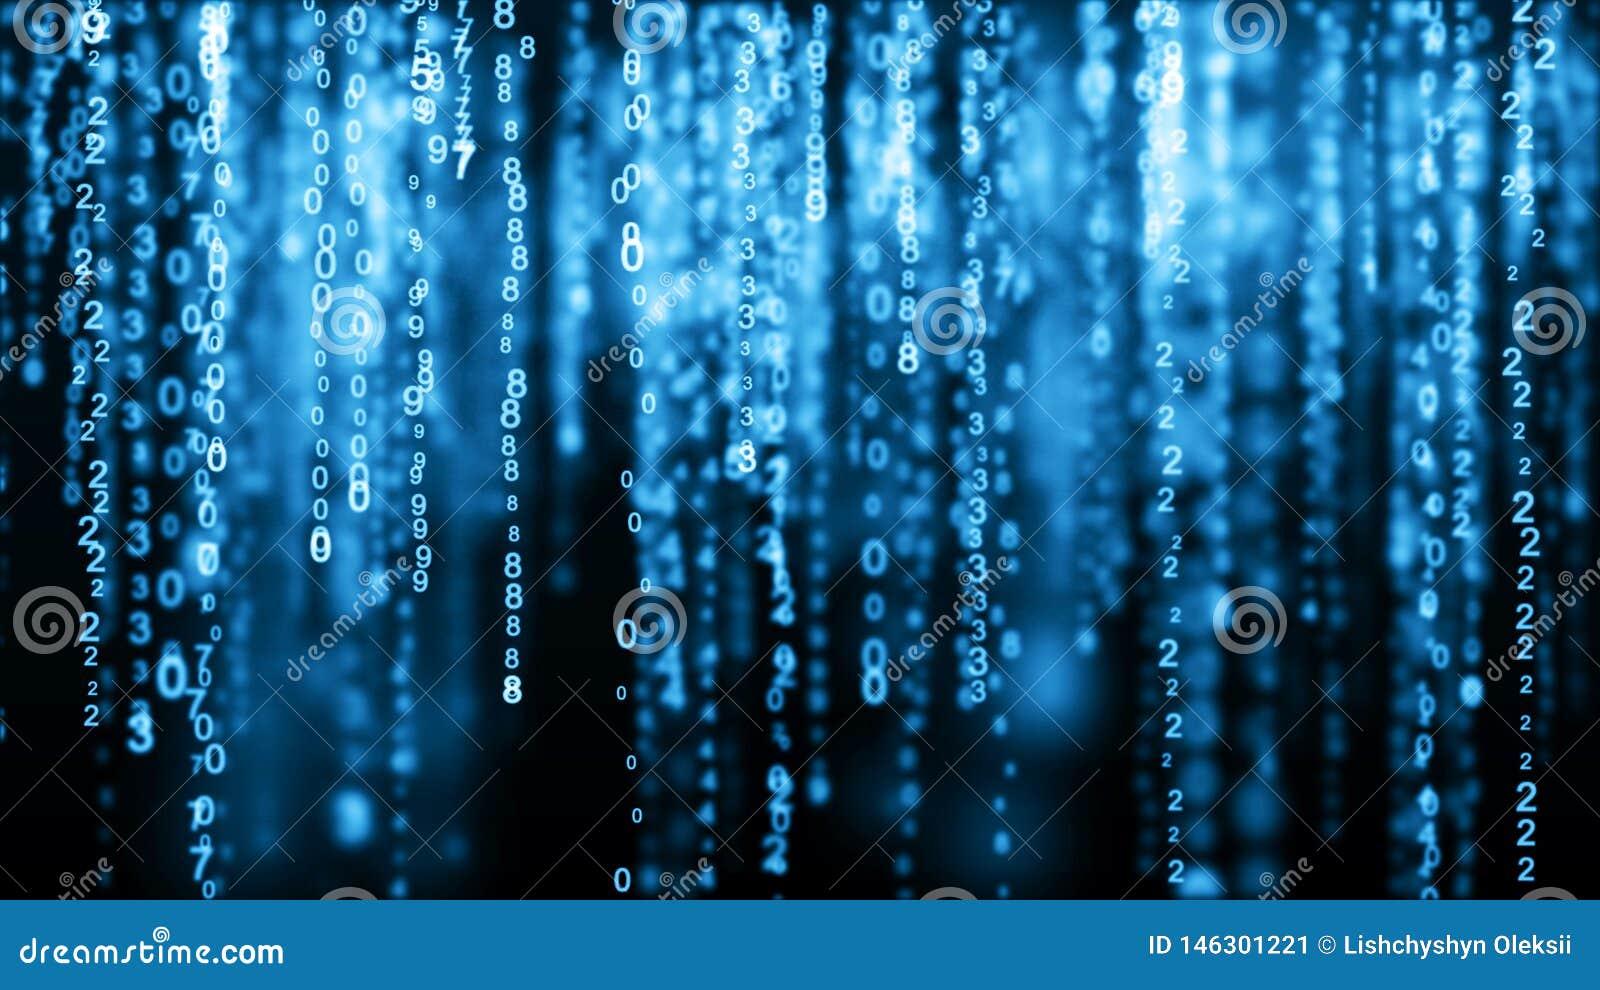 Matriz azul do fundo de Digitas C?digo de computador bin?rio Conceito do hacker rendi??o 3d